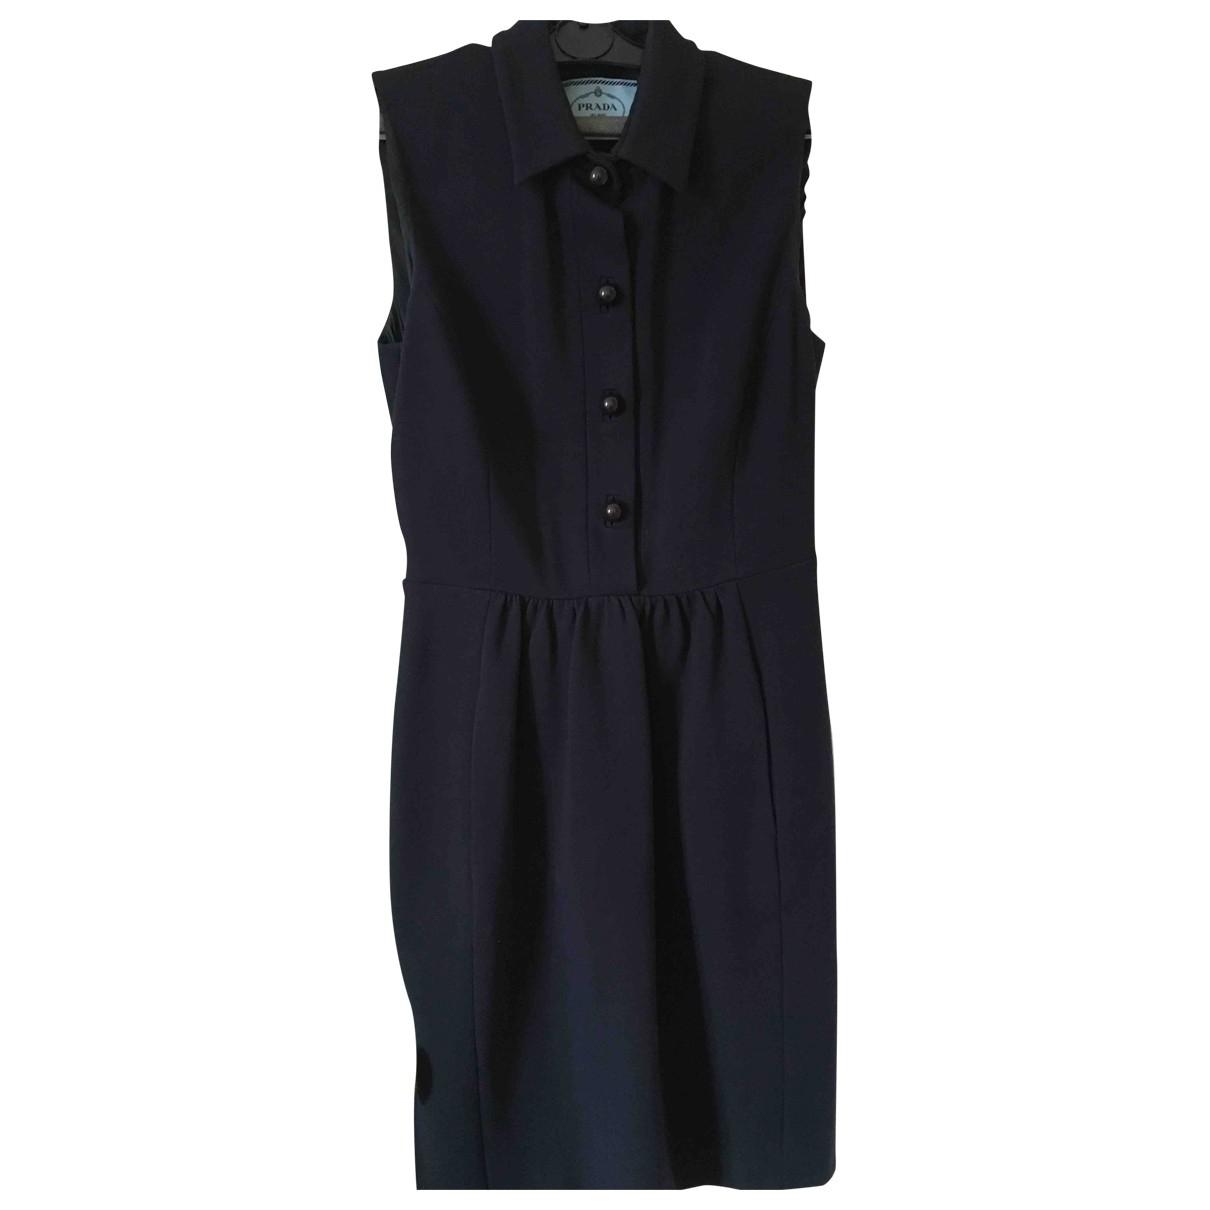 Prada \N Navy dress for Women 42 IT